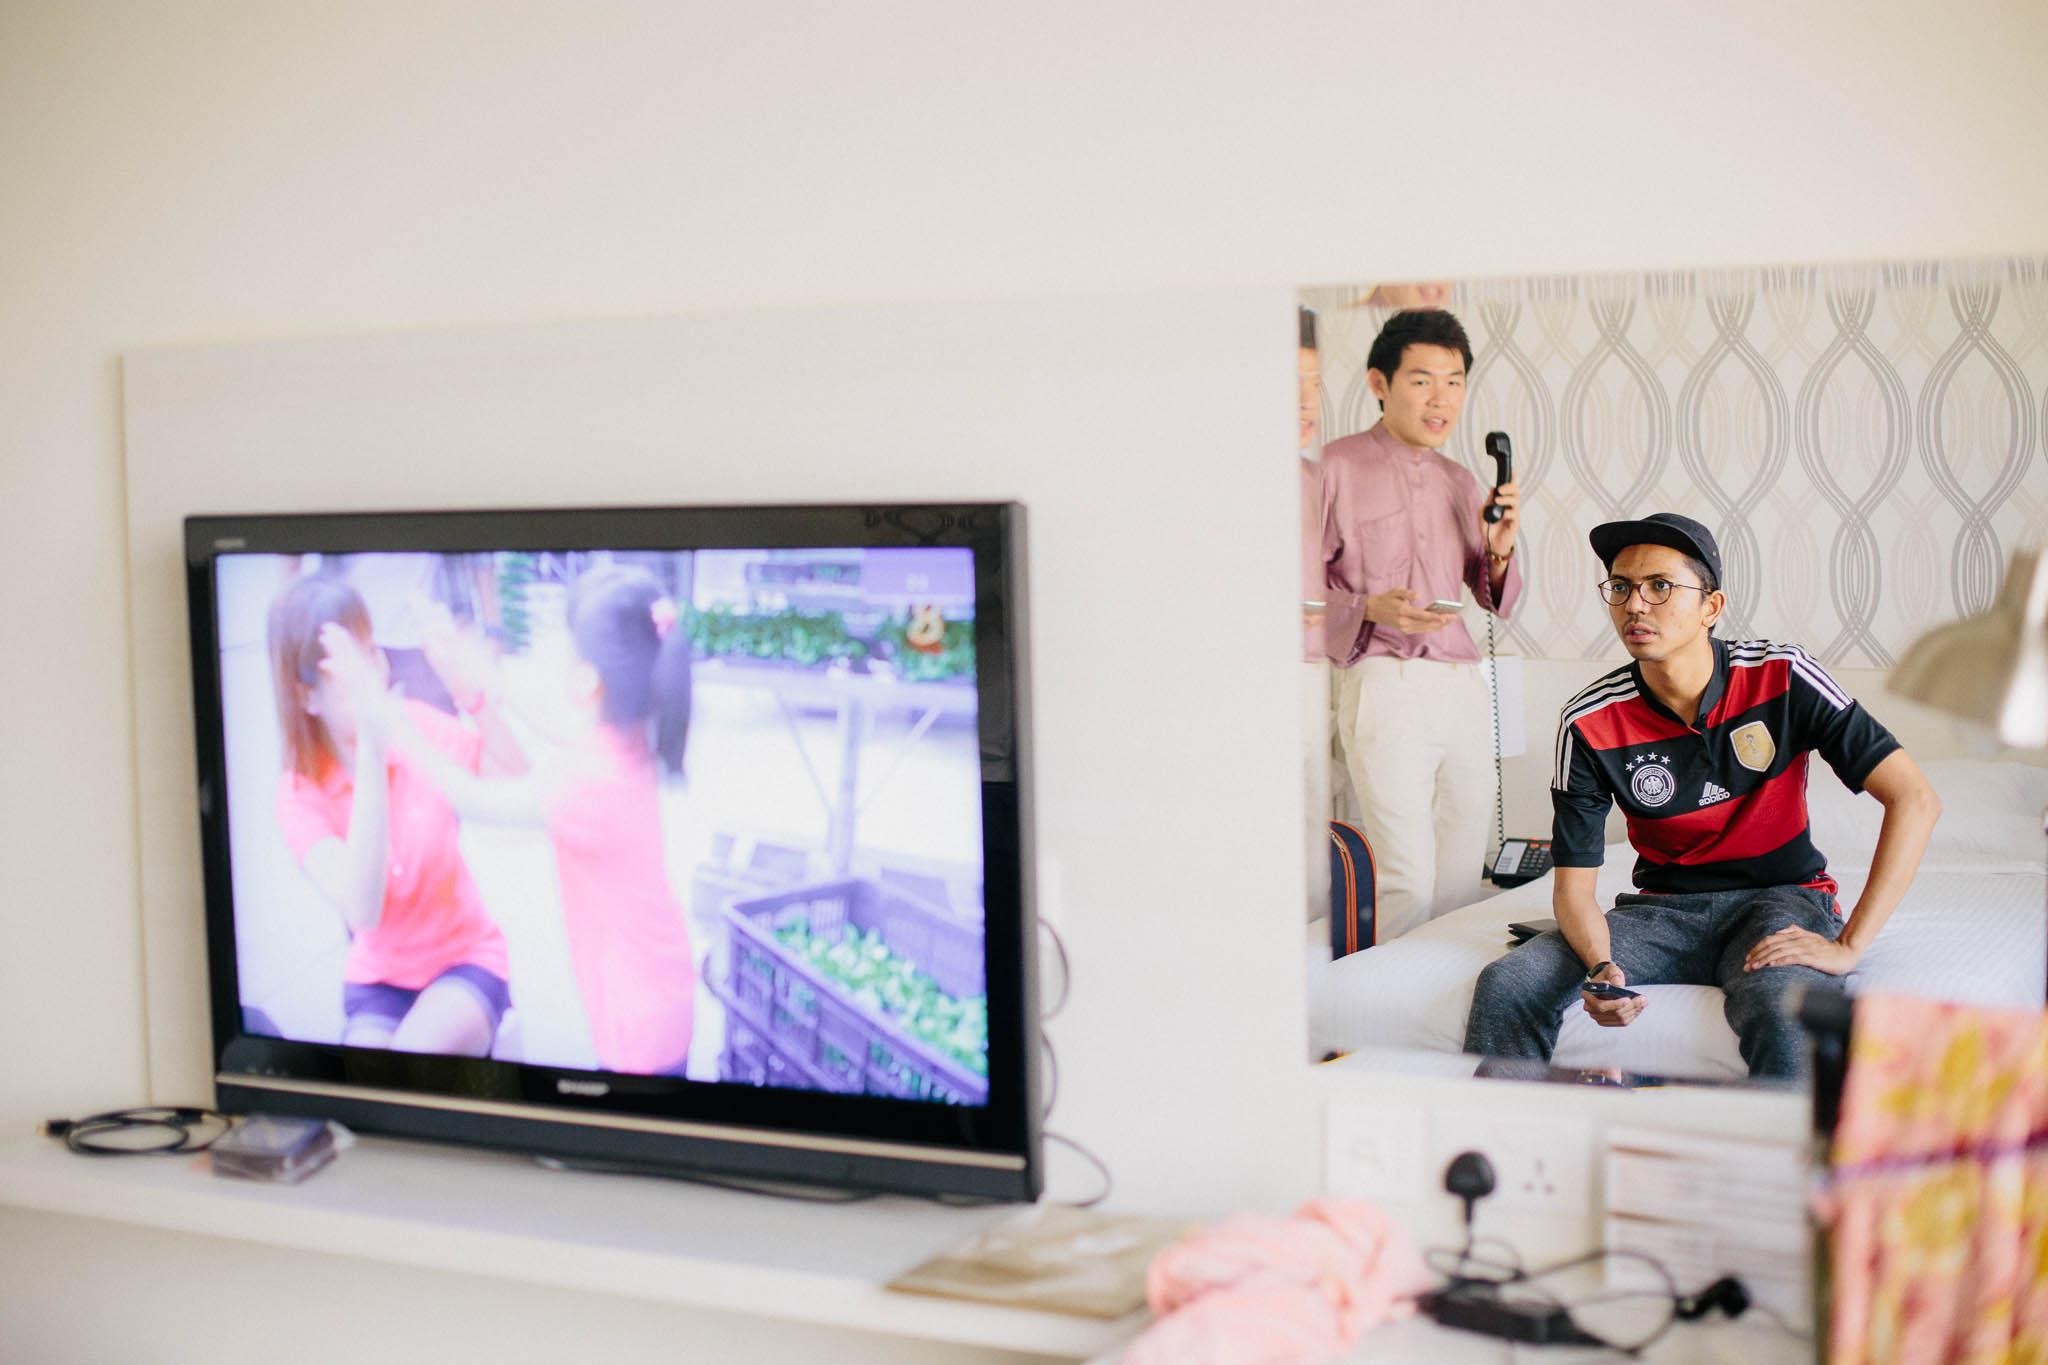 singapore-wedding-photographer-malay-indian-pre-wedding-travel-wmt-2015-shereen-farid-04.jpg